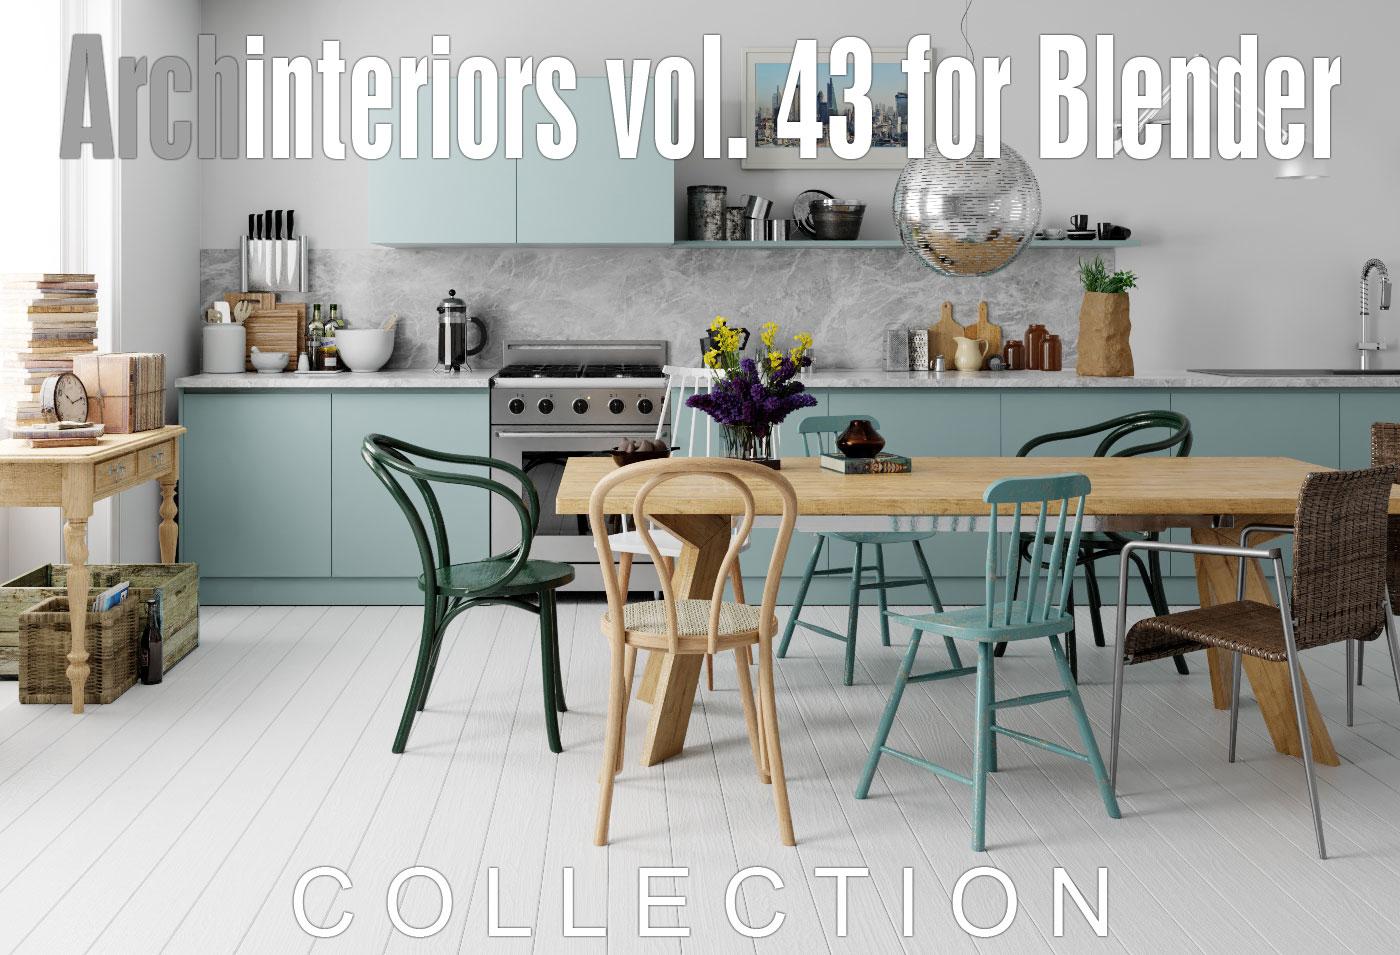 archinteriors vol 43 blender model